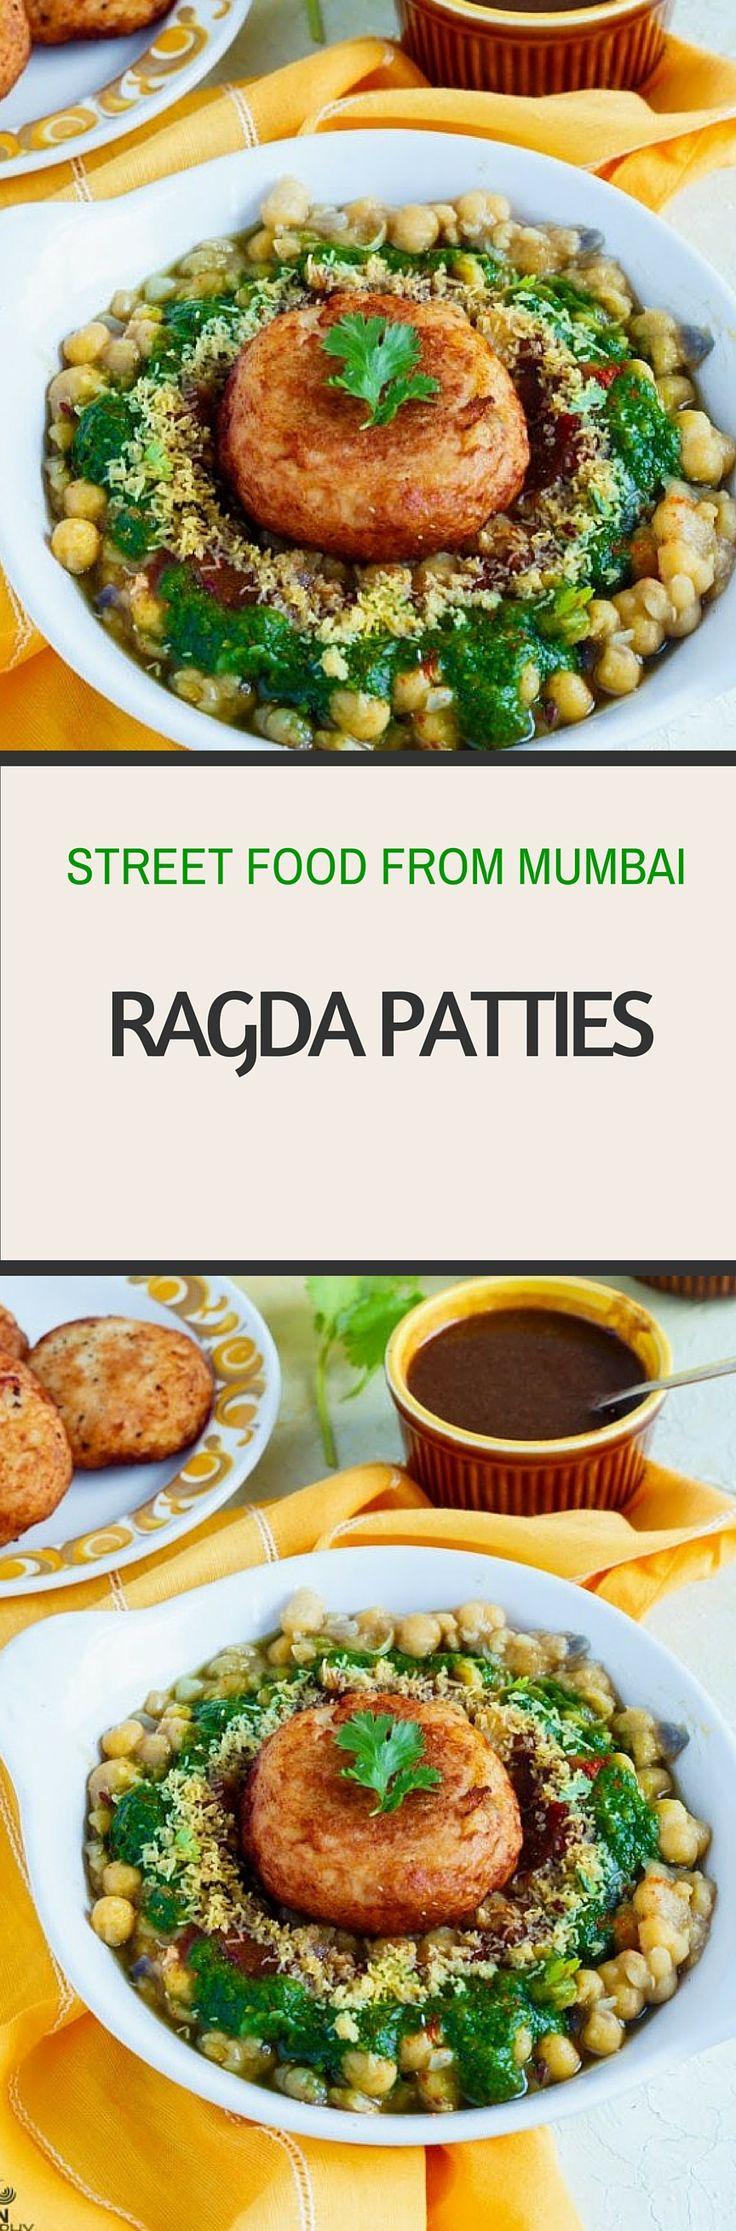 Ragda Patties, Street Food from Mumbai Recipe, YUM Veggie Snack,  @sandhyaskitchen, via @sunjayjk